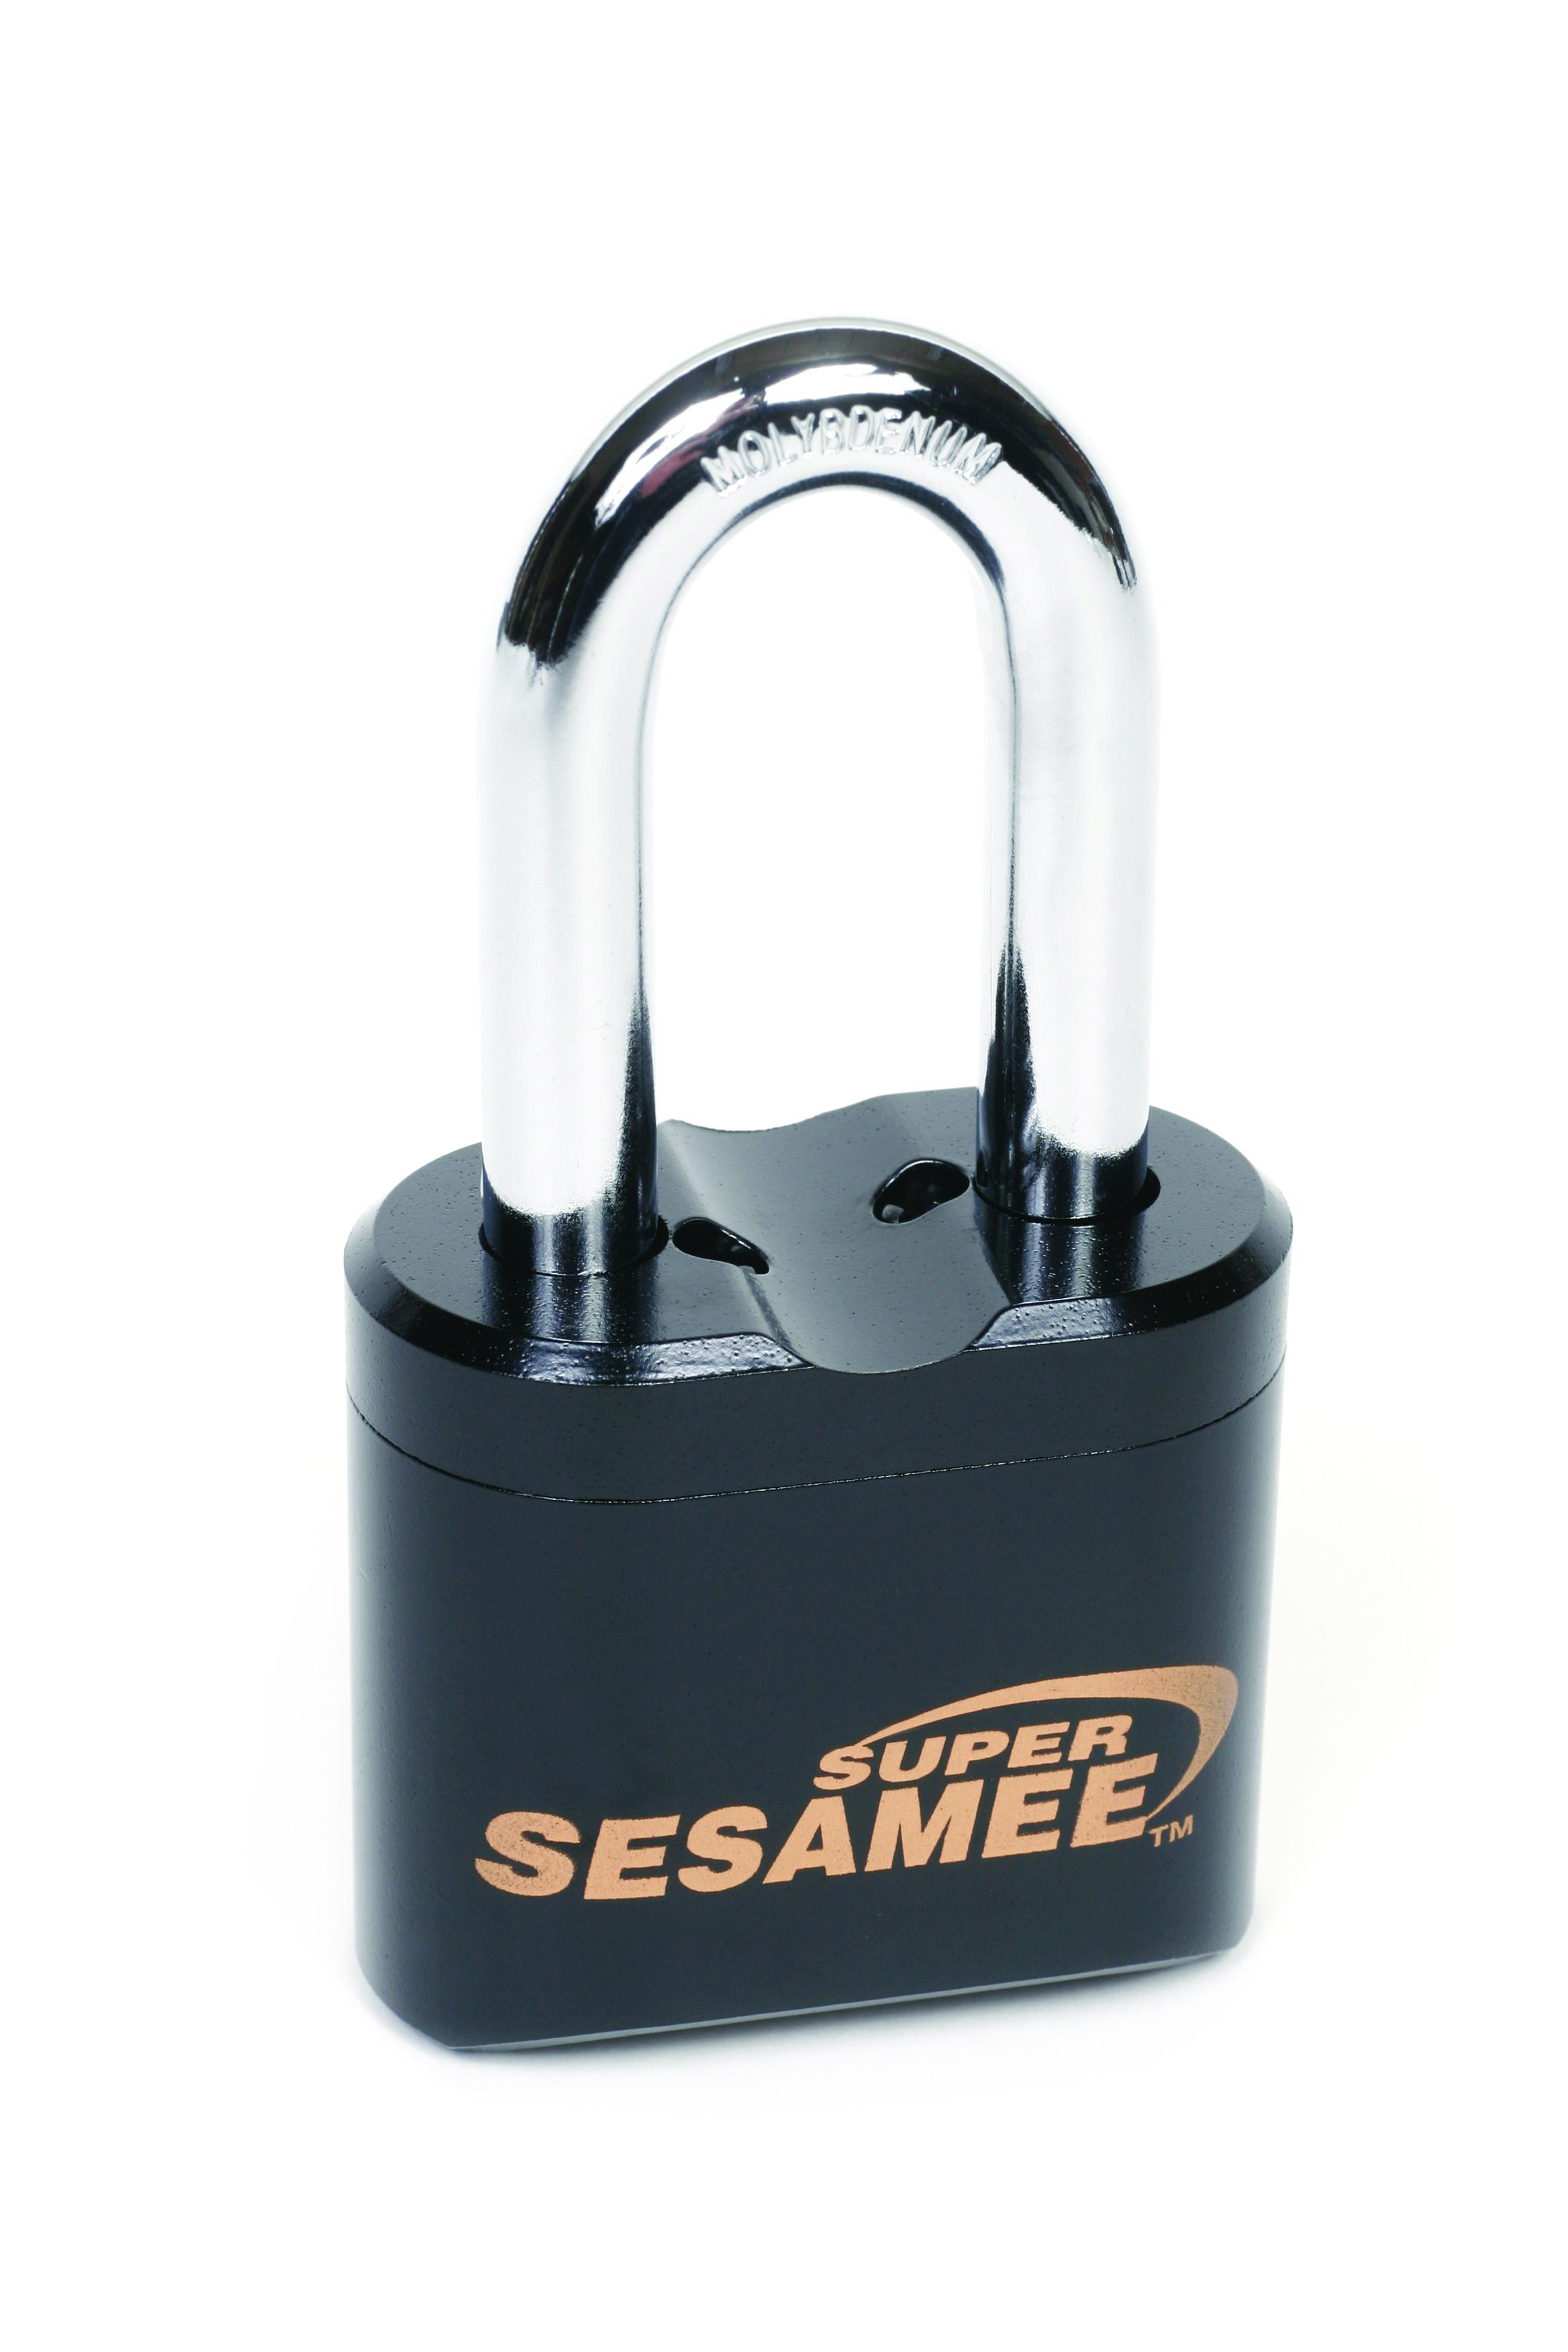 Super Sesamee Heavy-Duty 4-Dial Padlock K637